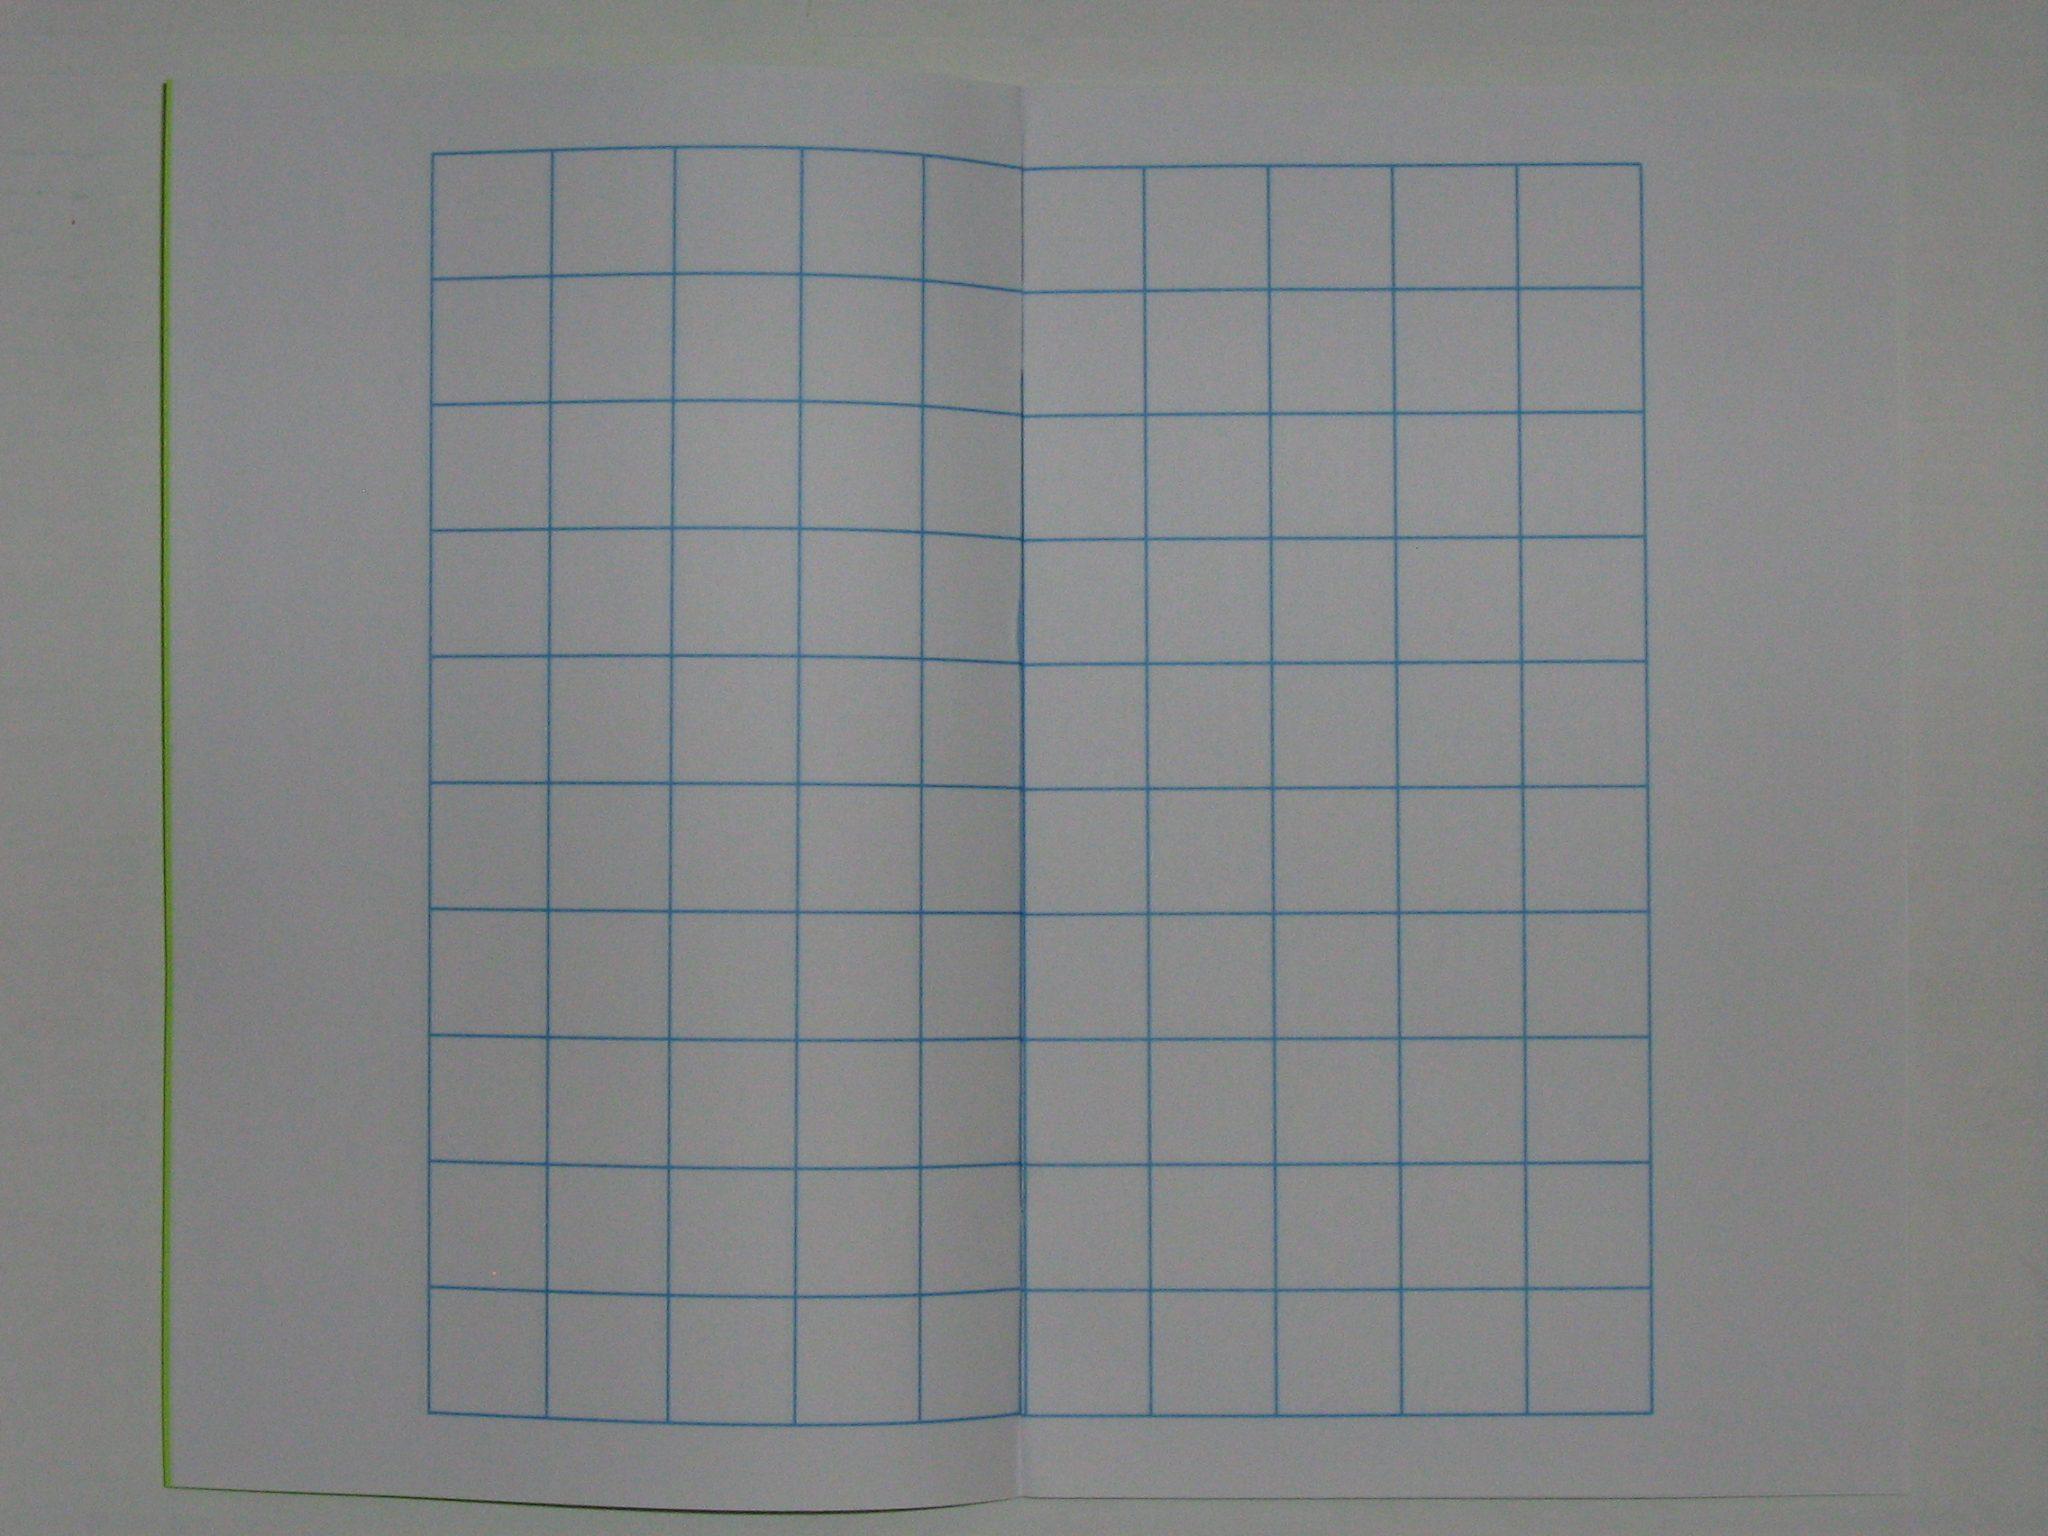 Beginner Math Booklets Archives - Viking Printing